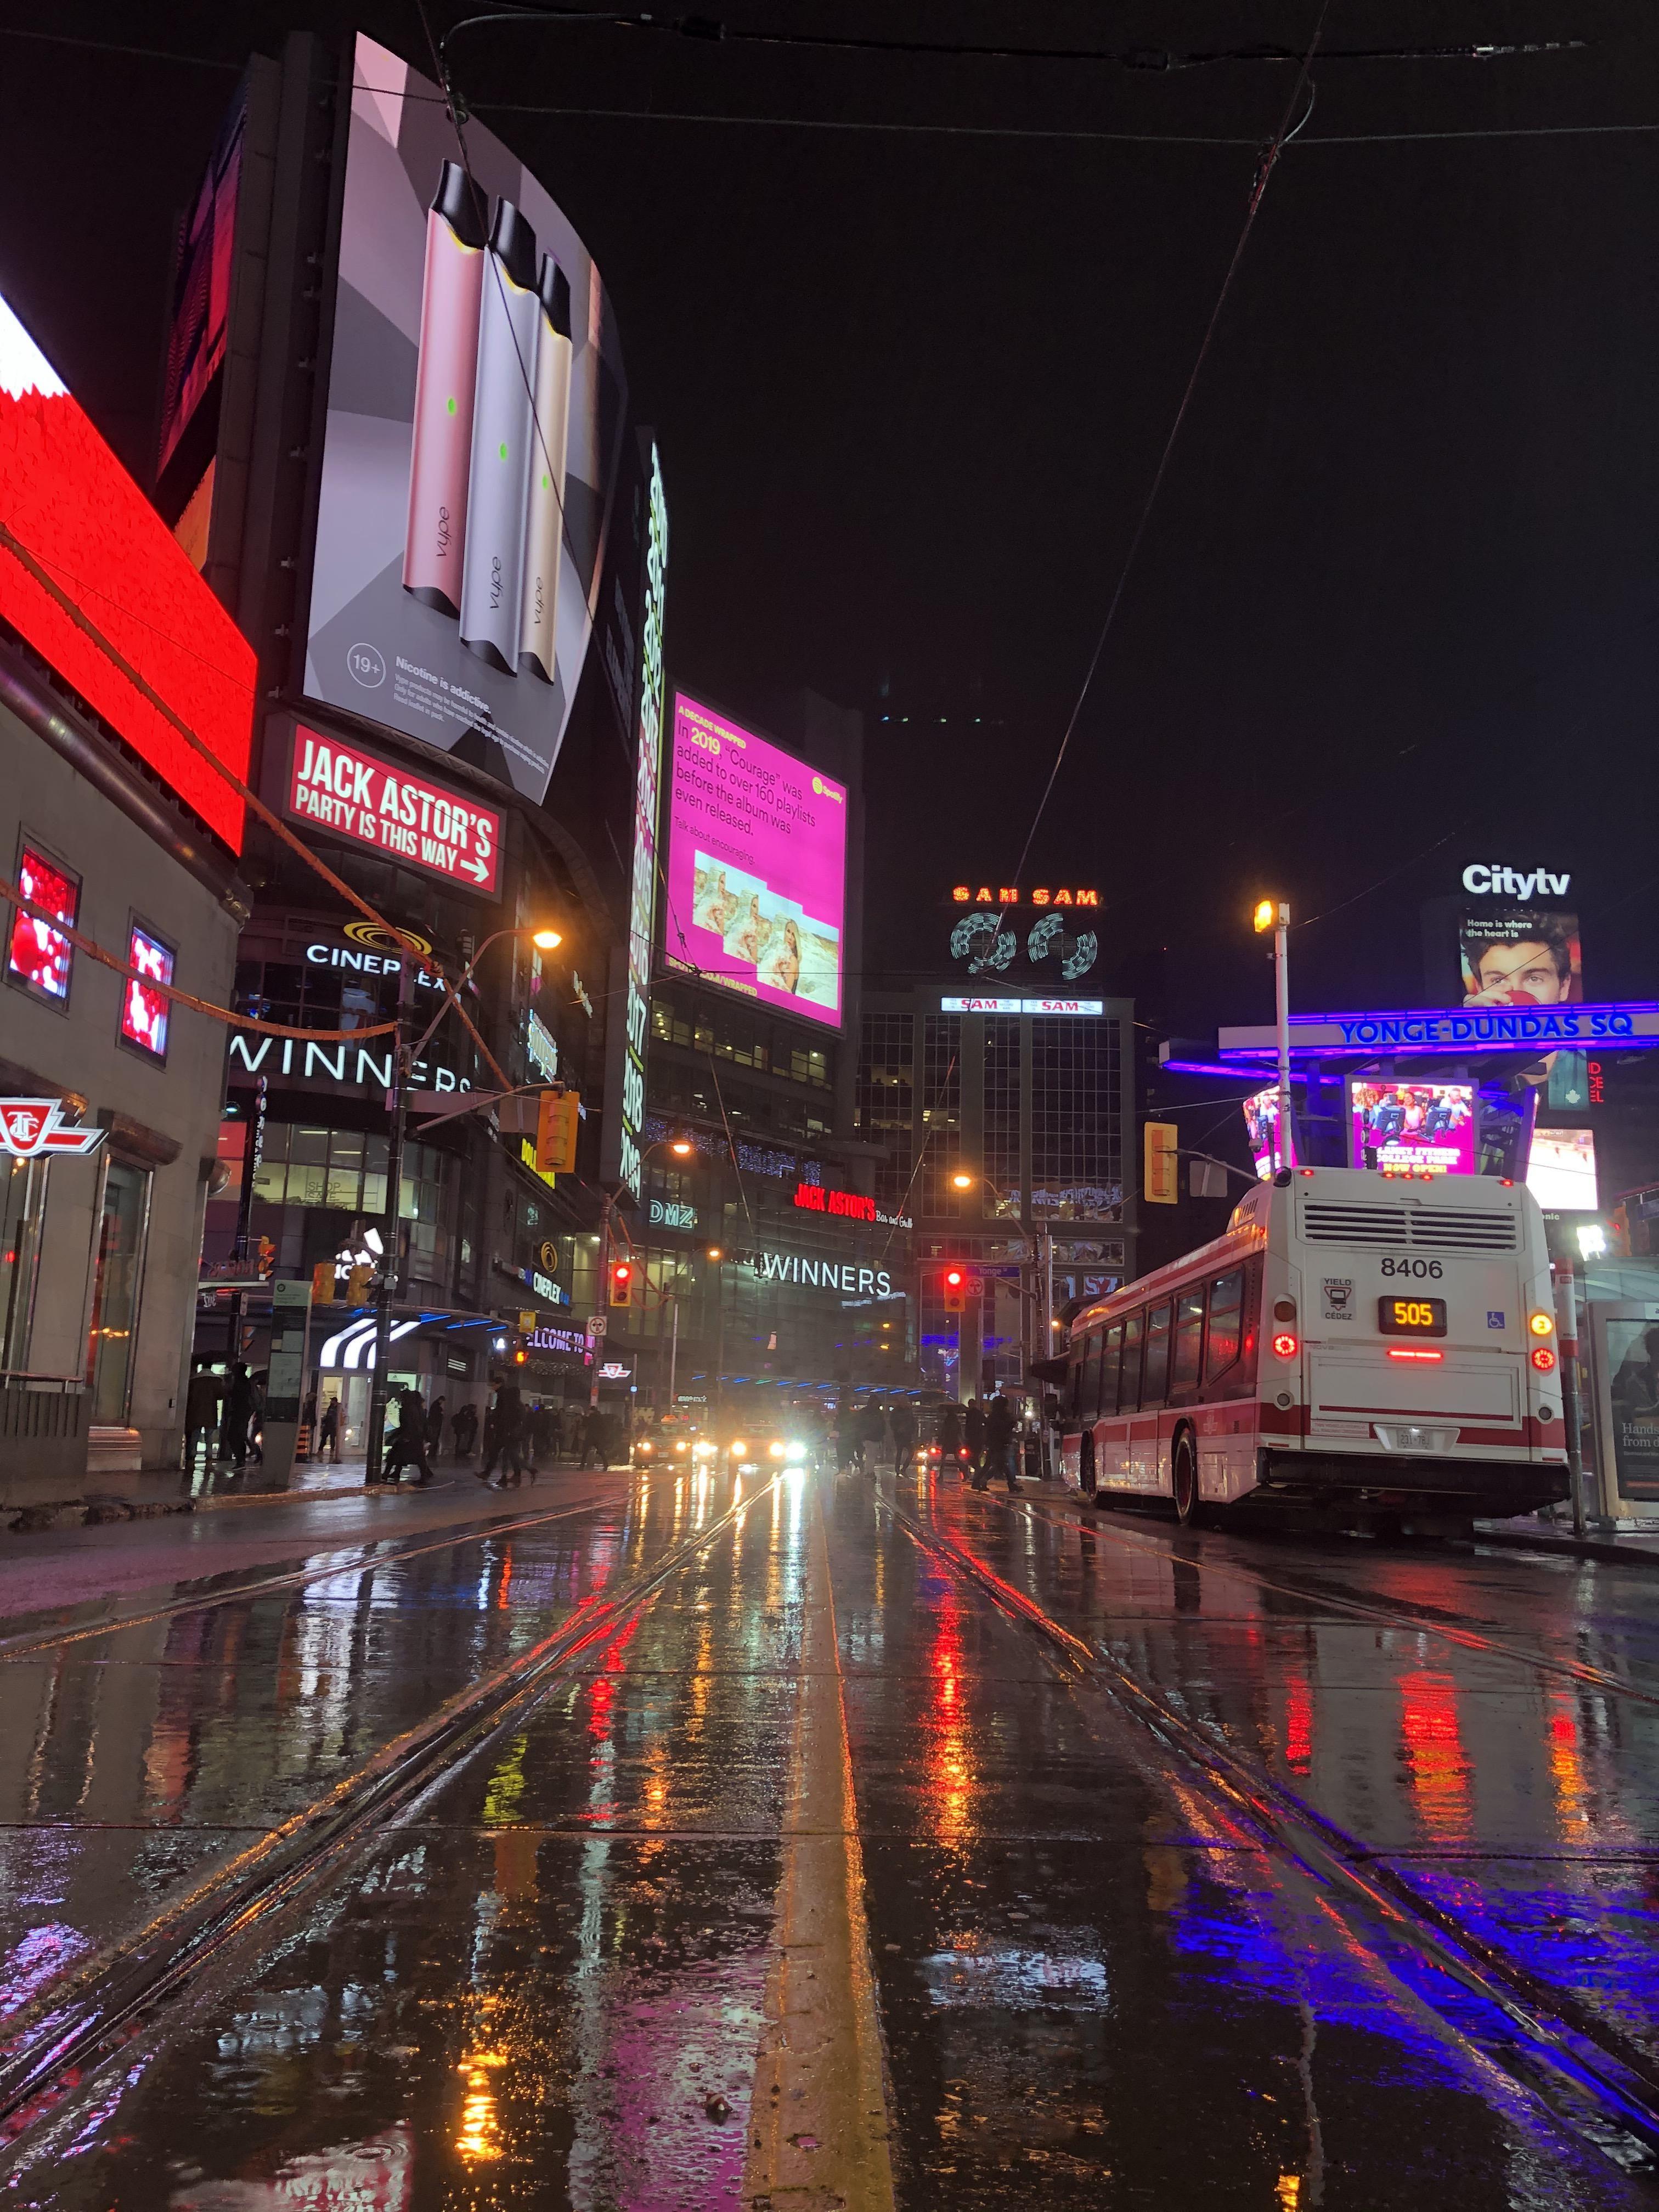 Downtown Toronto on a rainy January evening